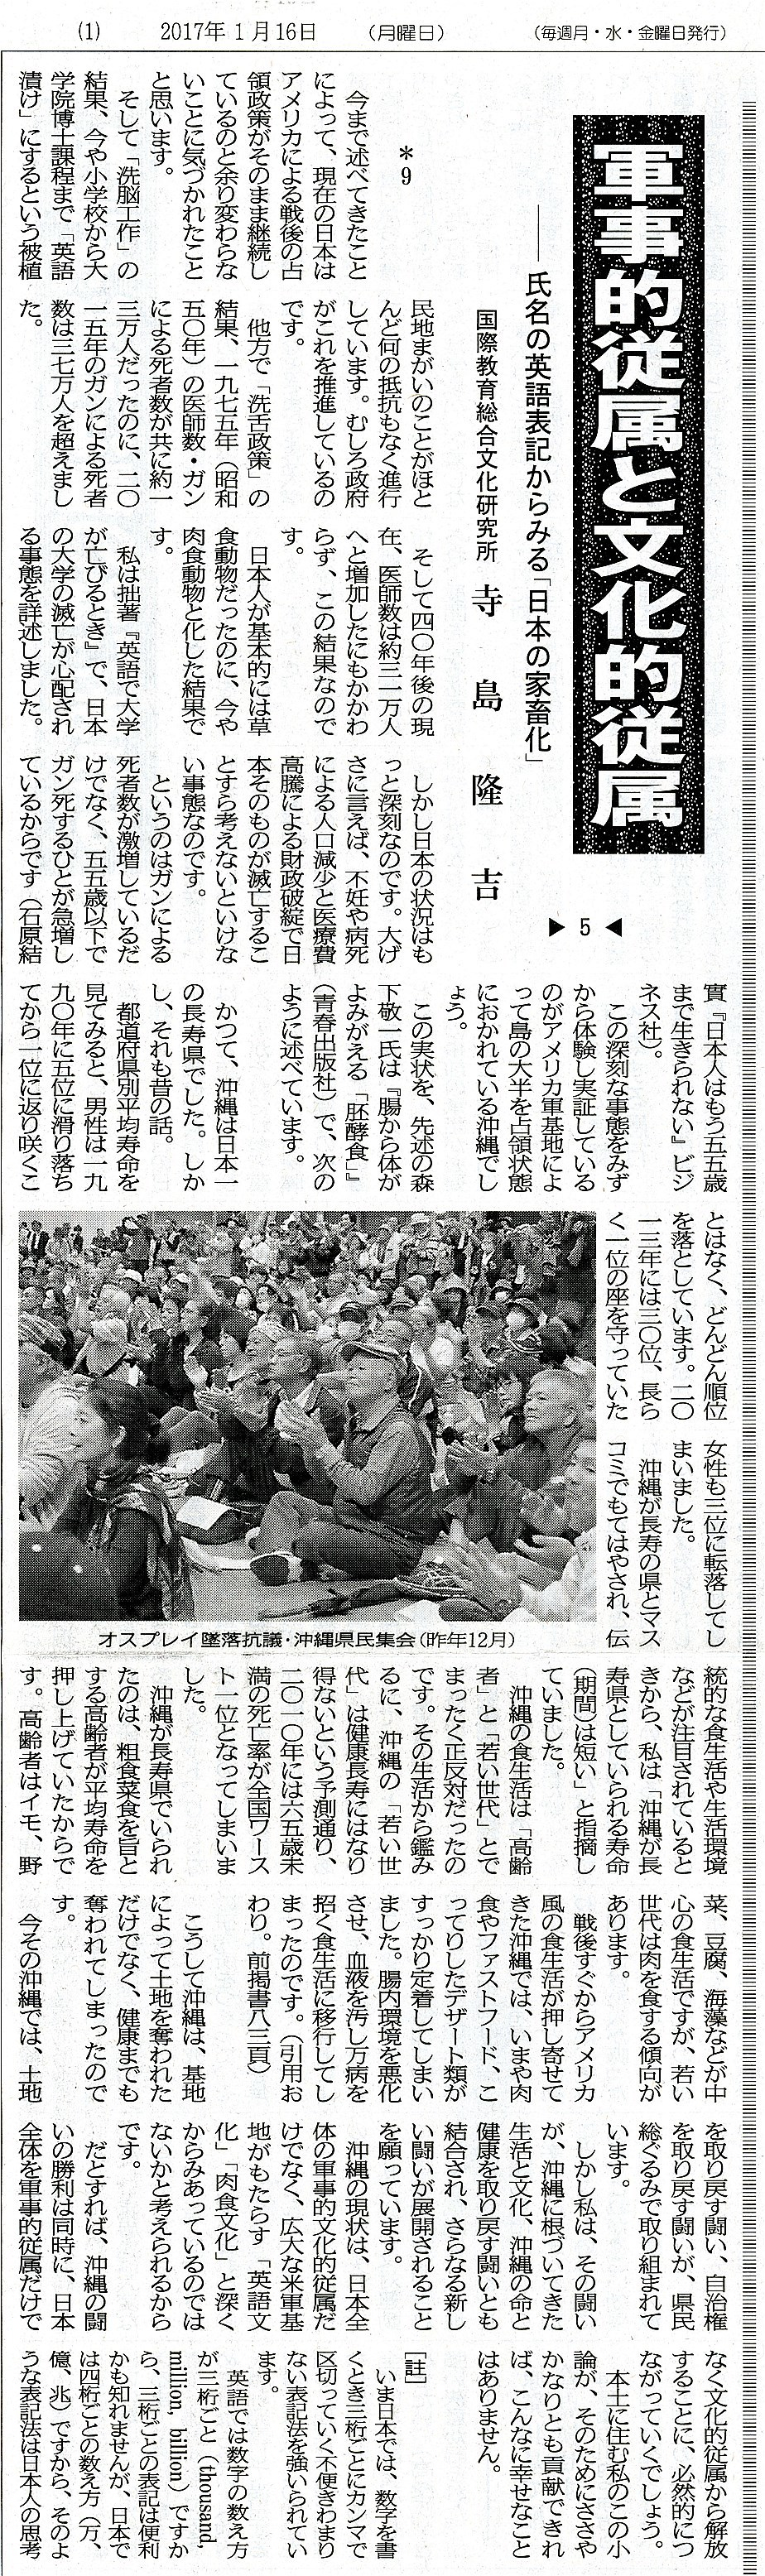 s-長周新聞20170116 軍事的従属と文化的従属5-1